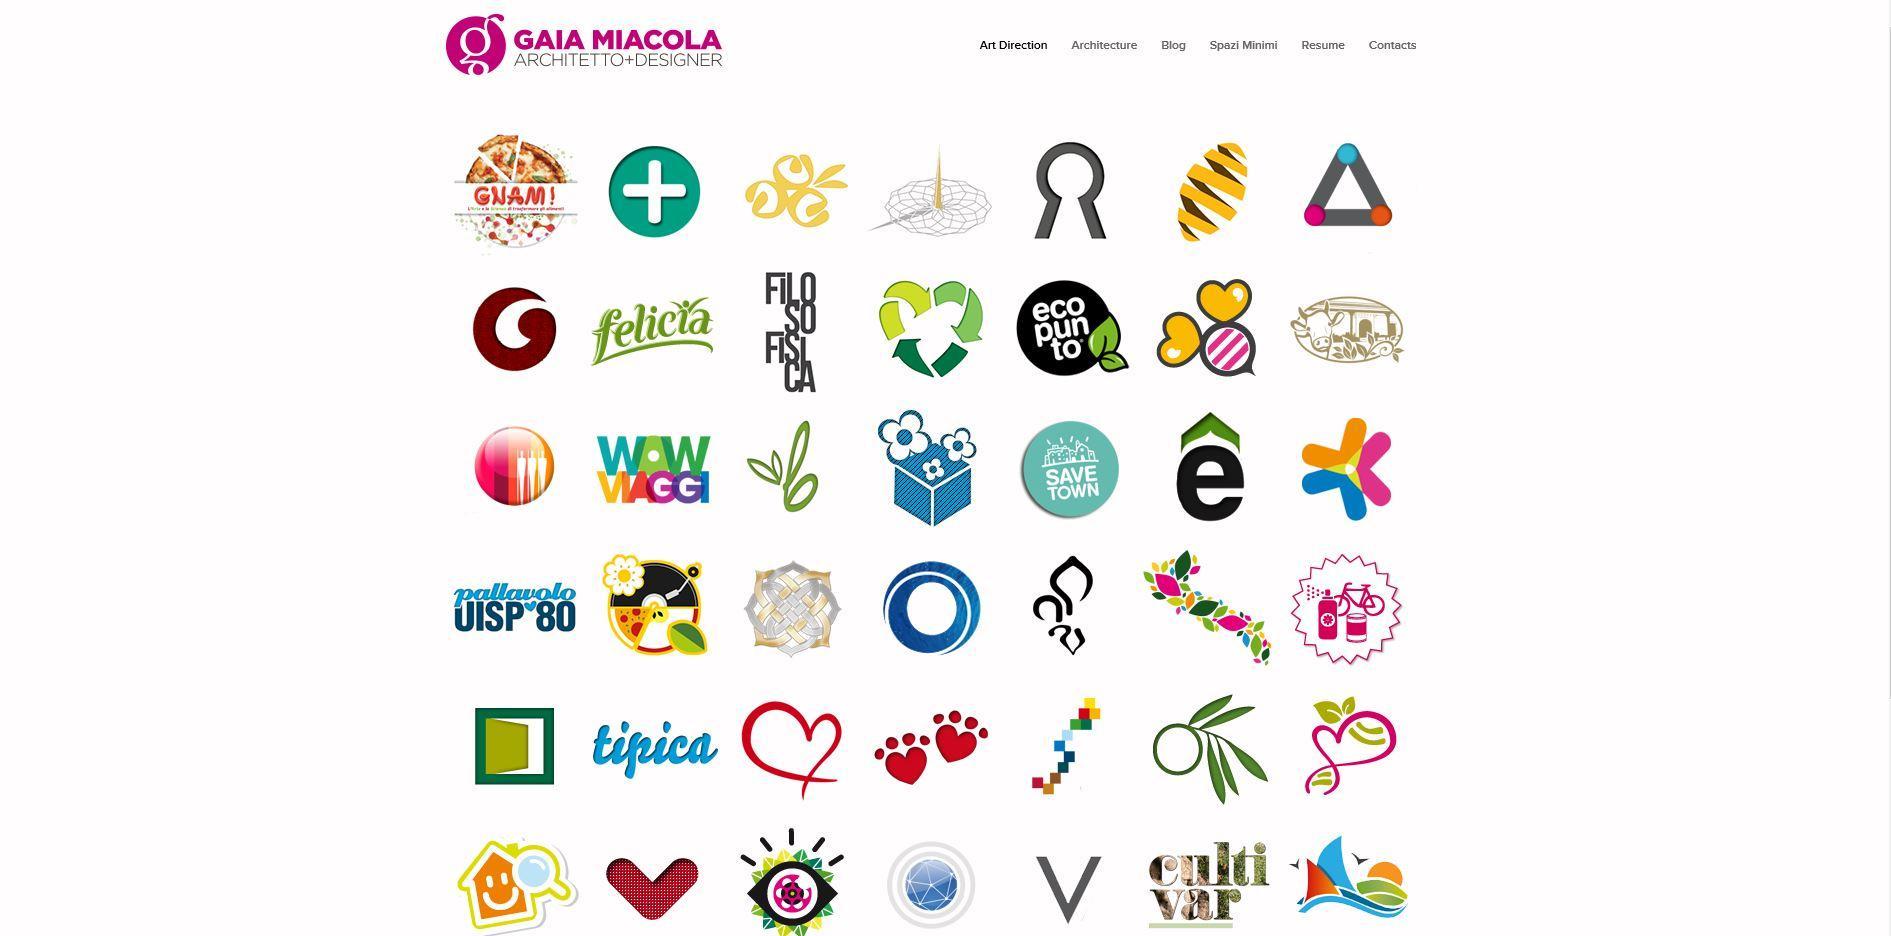 Gaia Miacola portfolio - image 1 - student project